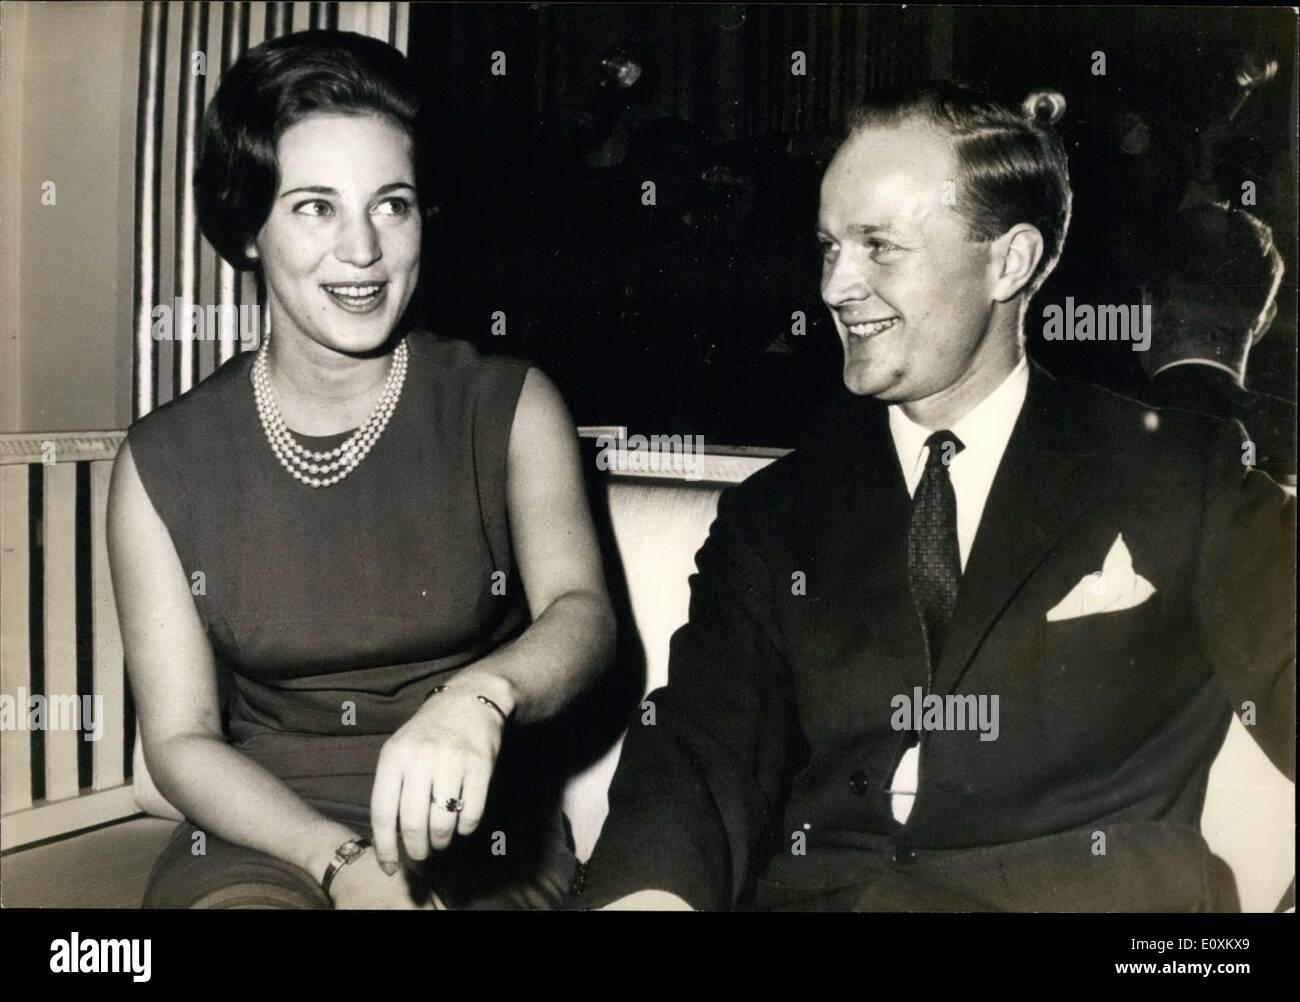 Mar. 15, 1967 - Princess Benedikte and Fianc?, Prince Robert - Stock Image